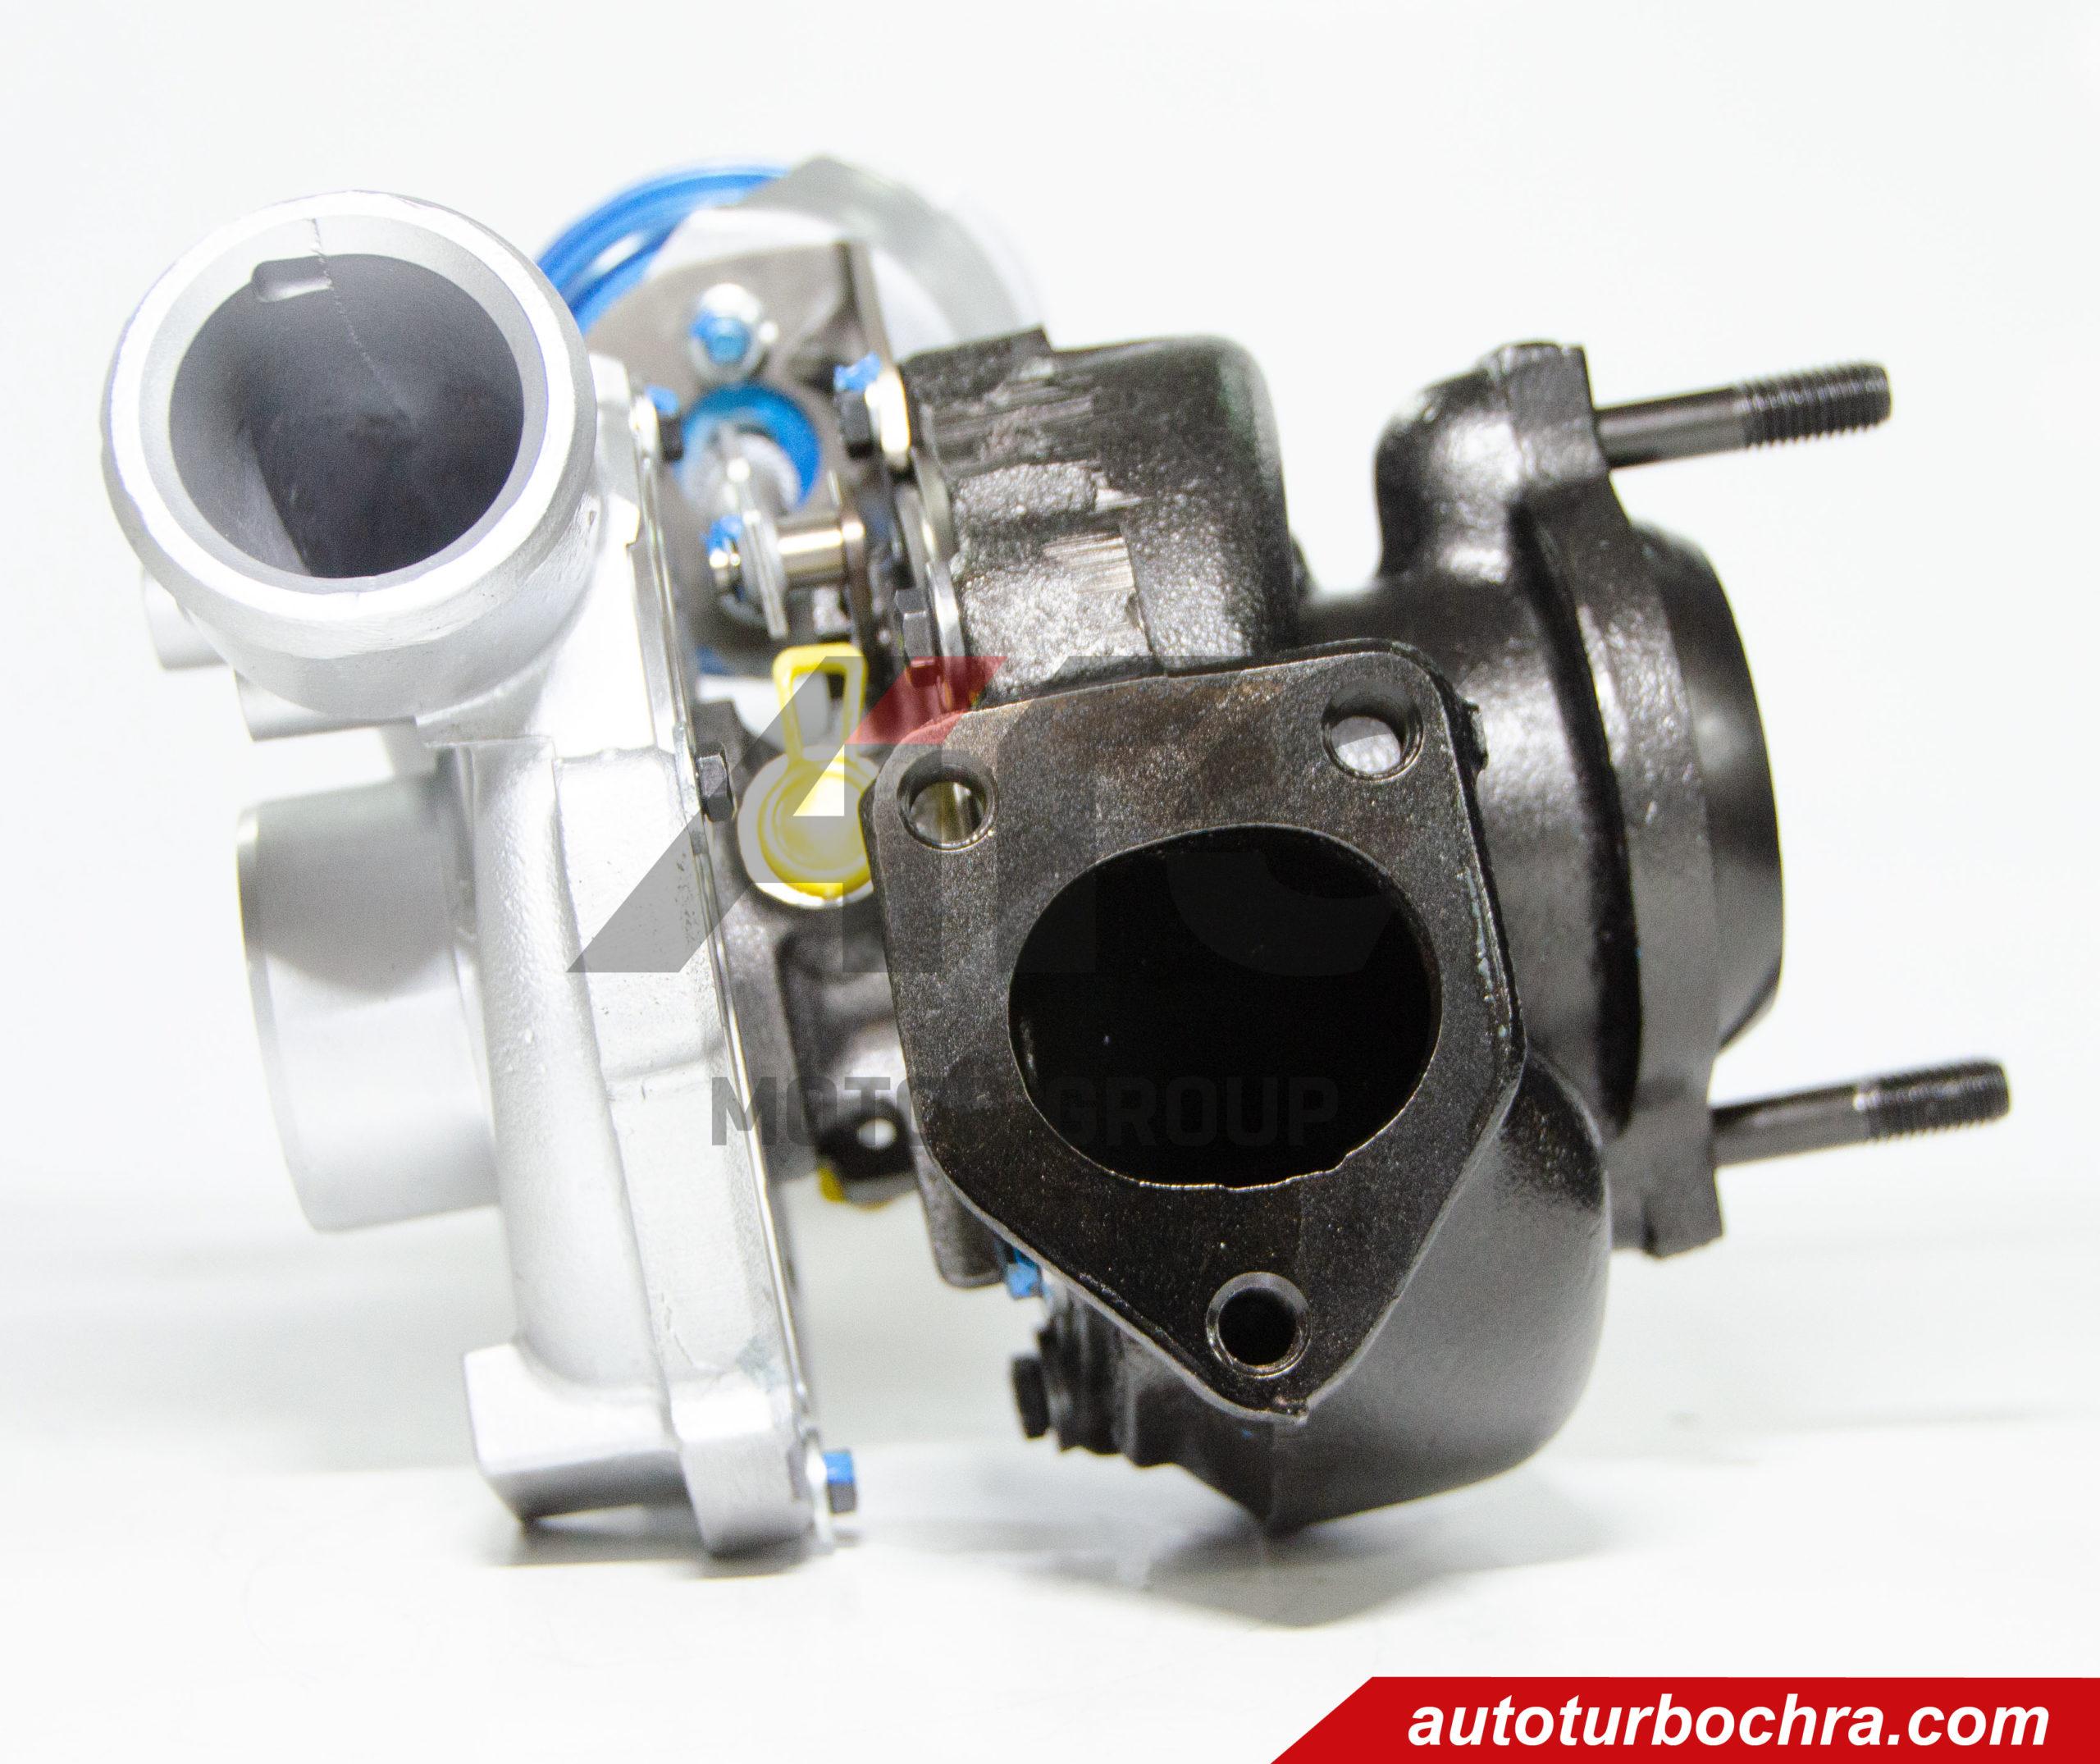 Turbo híbrido ATC-HB133 BMW 530 d (E39) /  X5 / 330 d